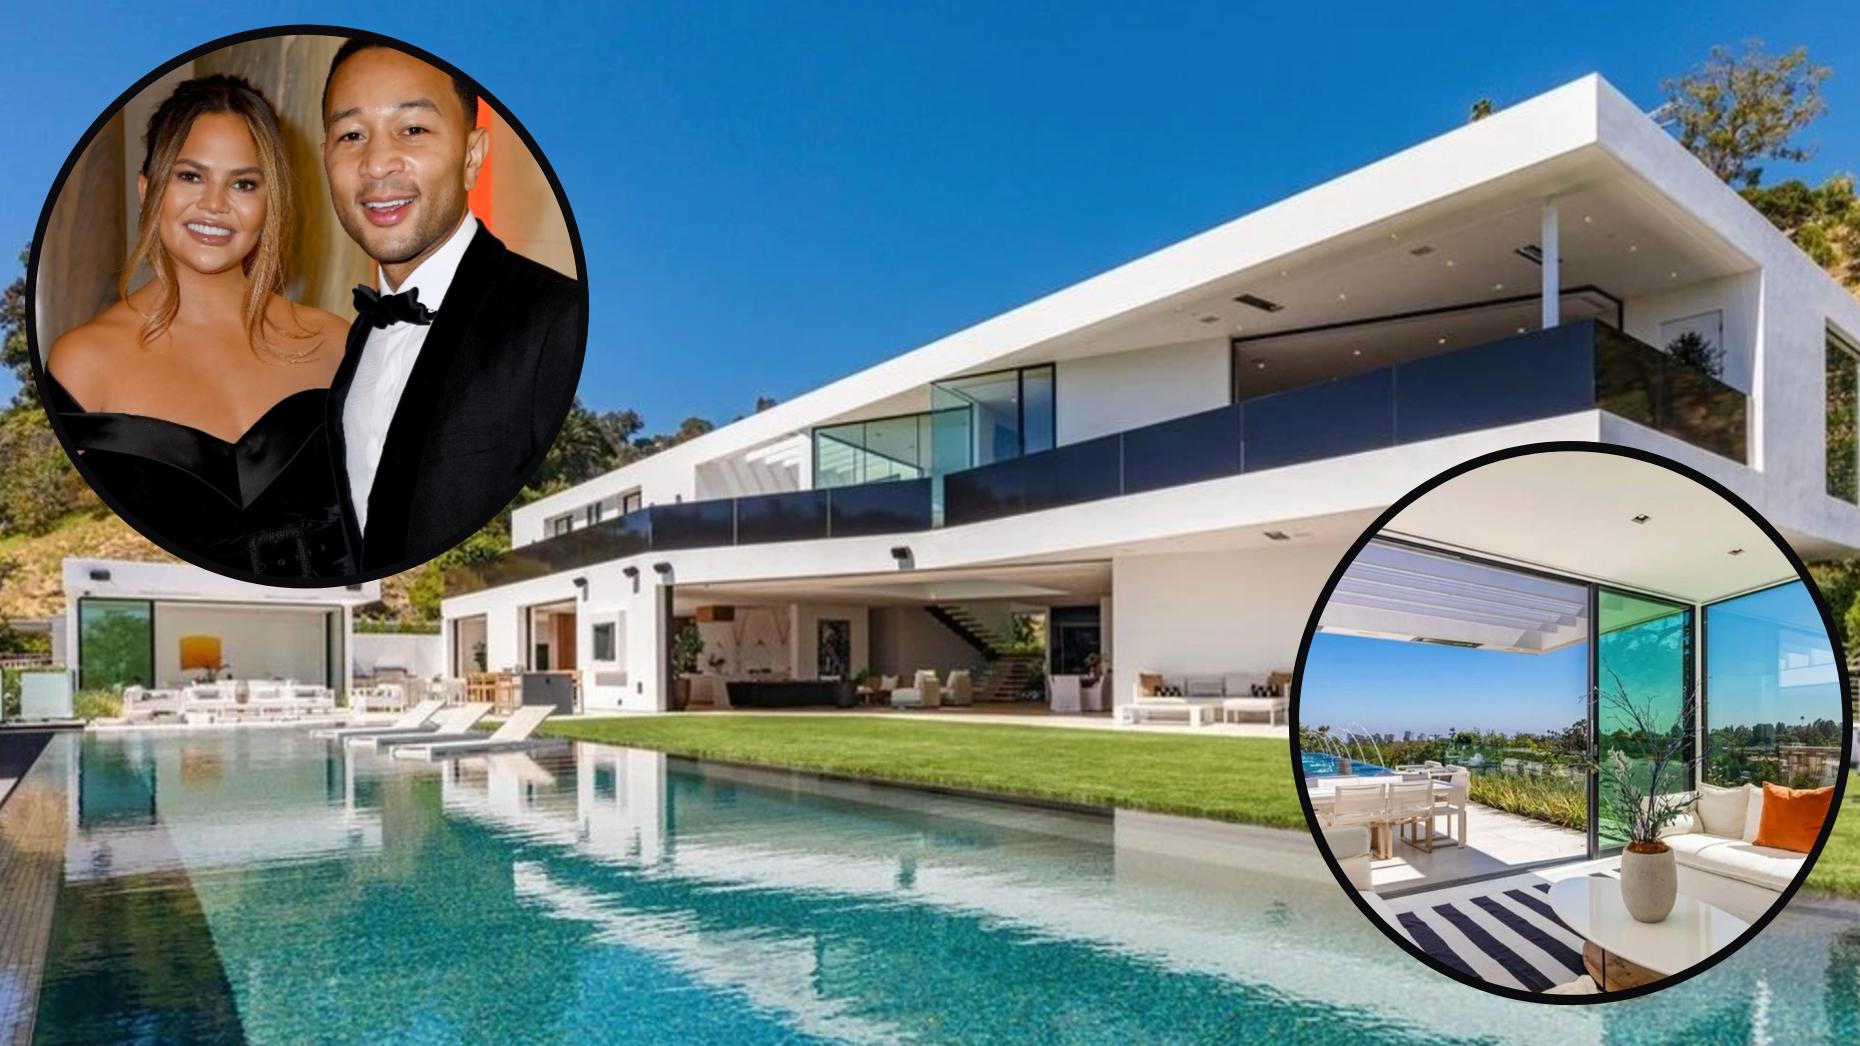 John Legend and Chrissy Teigen drop $17.5M on new home